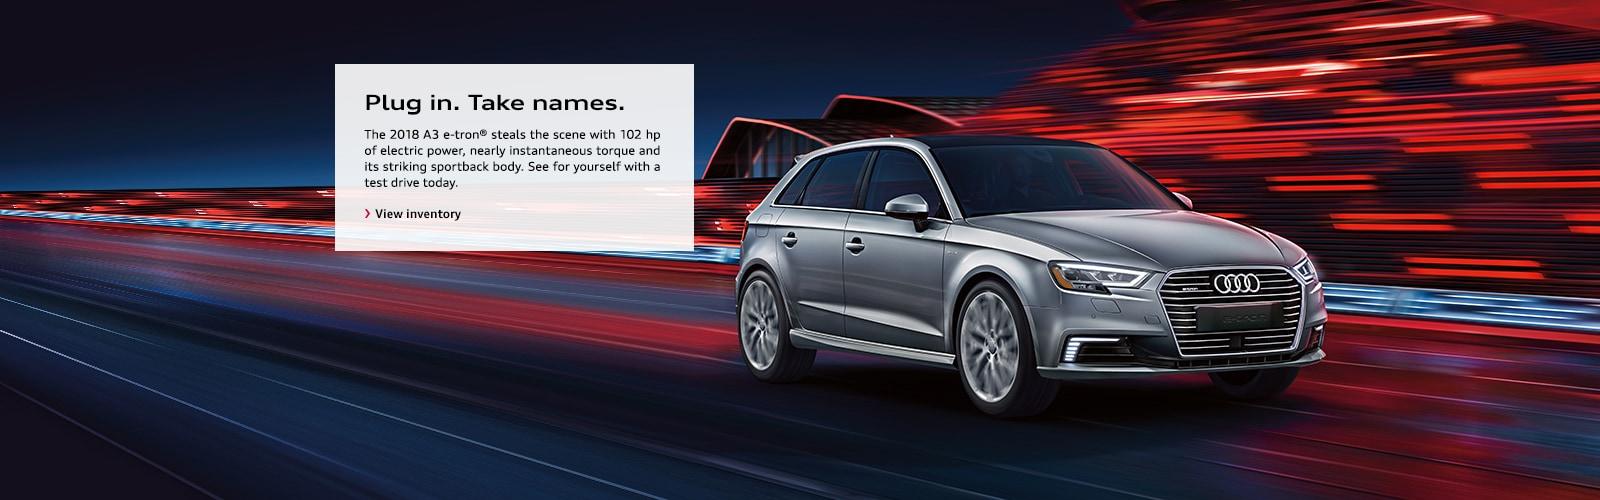 Rusnak Westlake Audi Dealership Thousand Oaks New Used Audi - Audi dealers in california